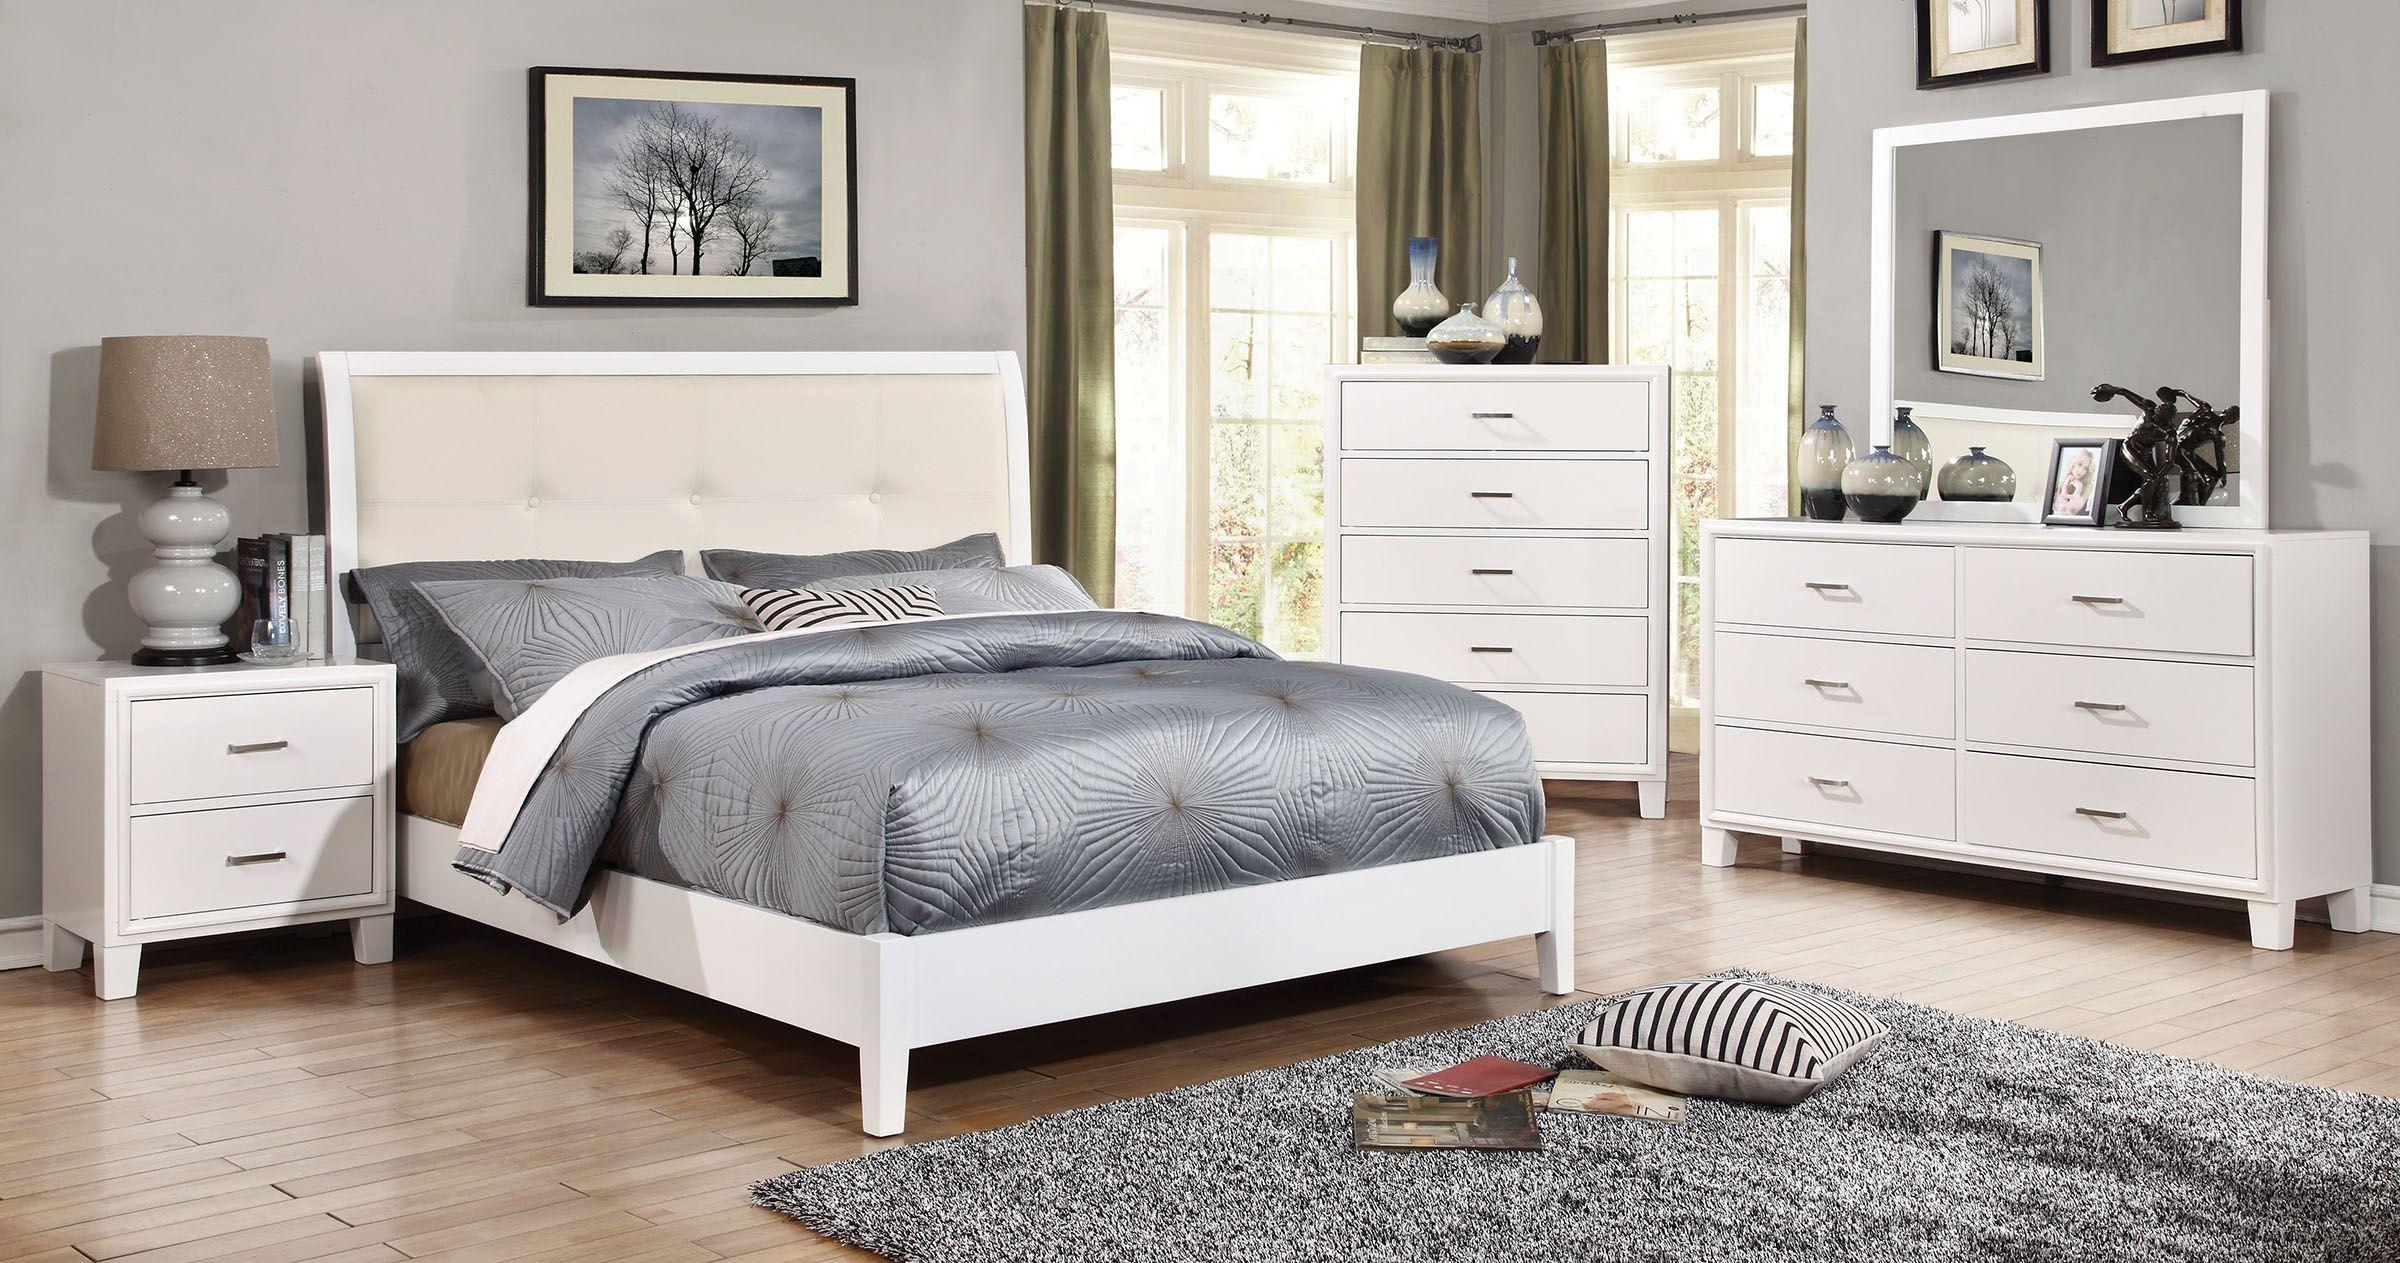 Enrico I White Upholstered Bedroom Set From Furniture Of America Coleman Furniture